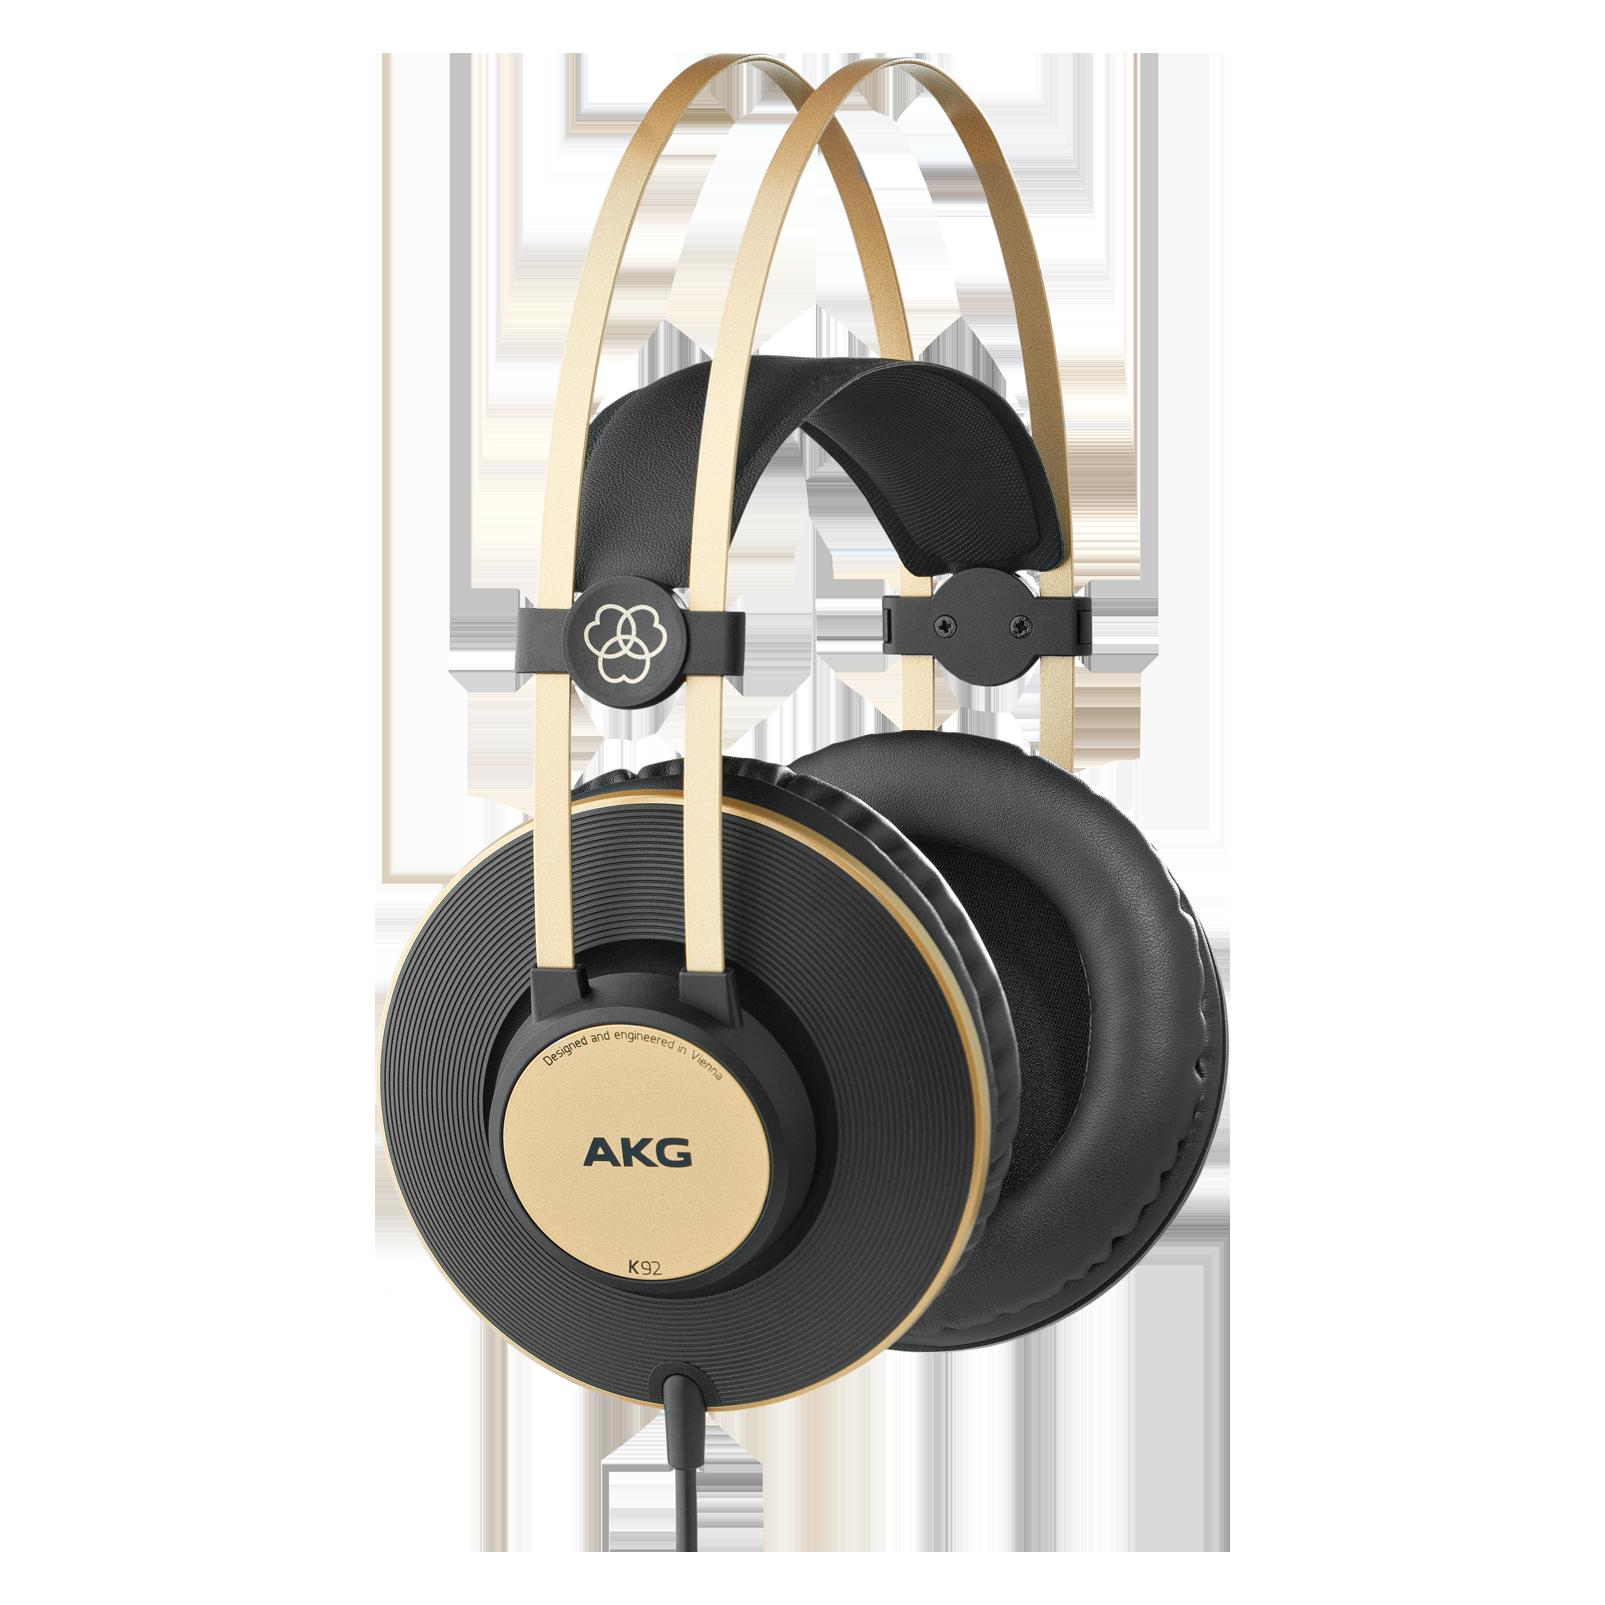 AKG K92 Closed-Back Professional Studio Headphones